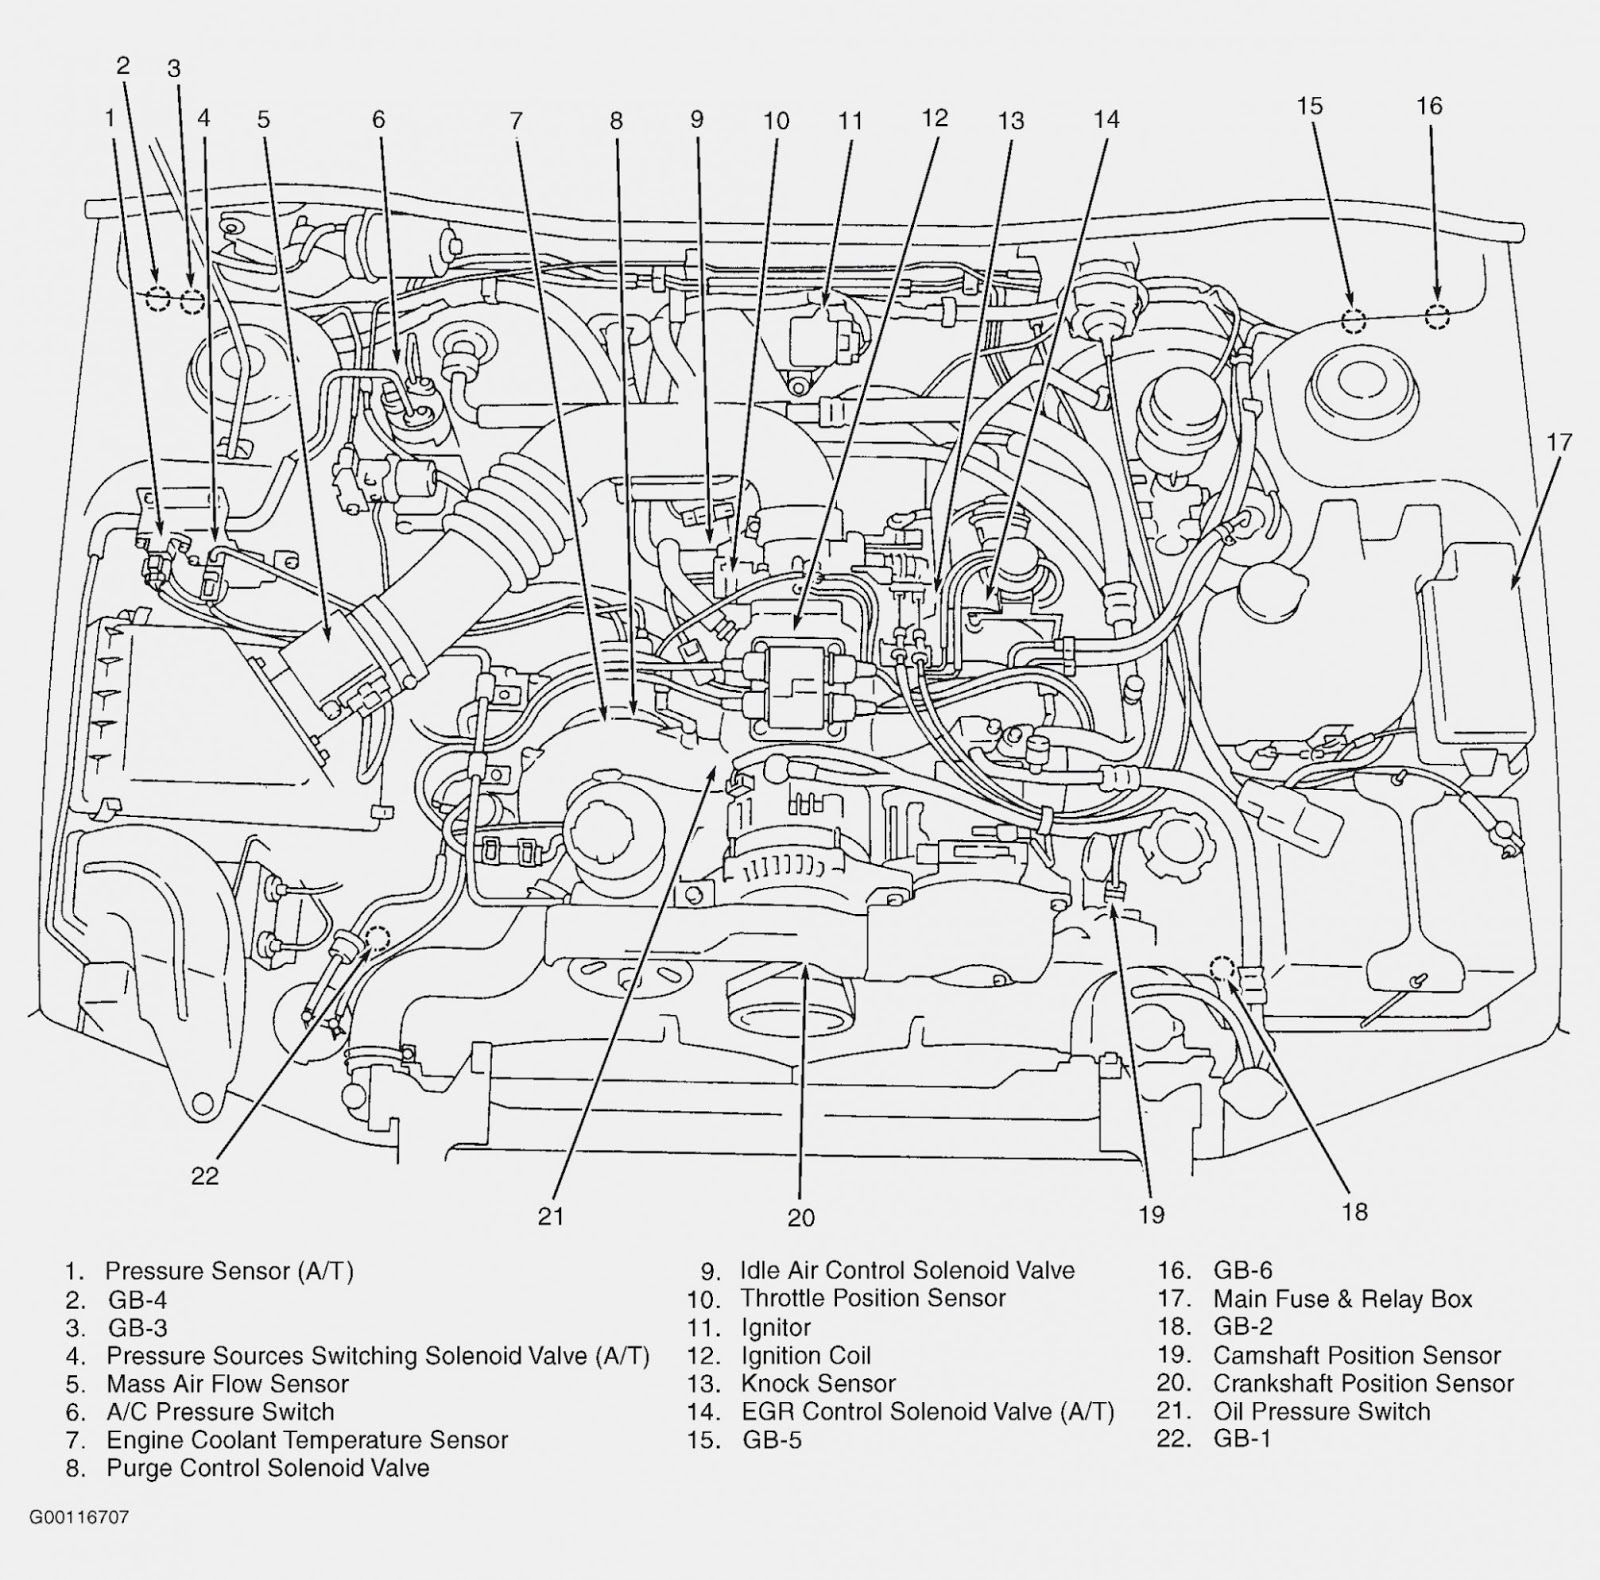 B7 Tribeca Wiring Schematic Diagram 2006 Subaru Outback Engine 7 Image in  2021 | Subaru legacy, Subaru outback, SubaruPinterest